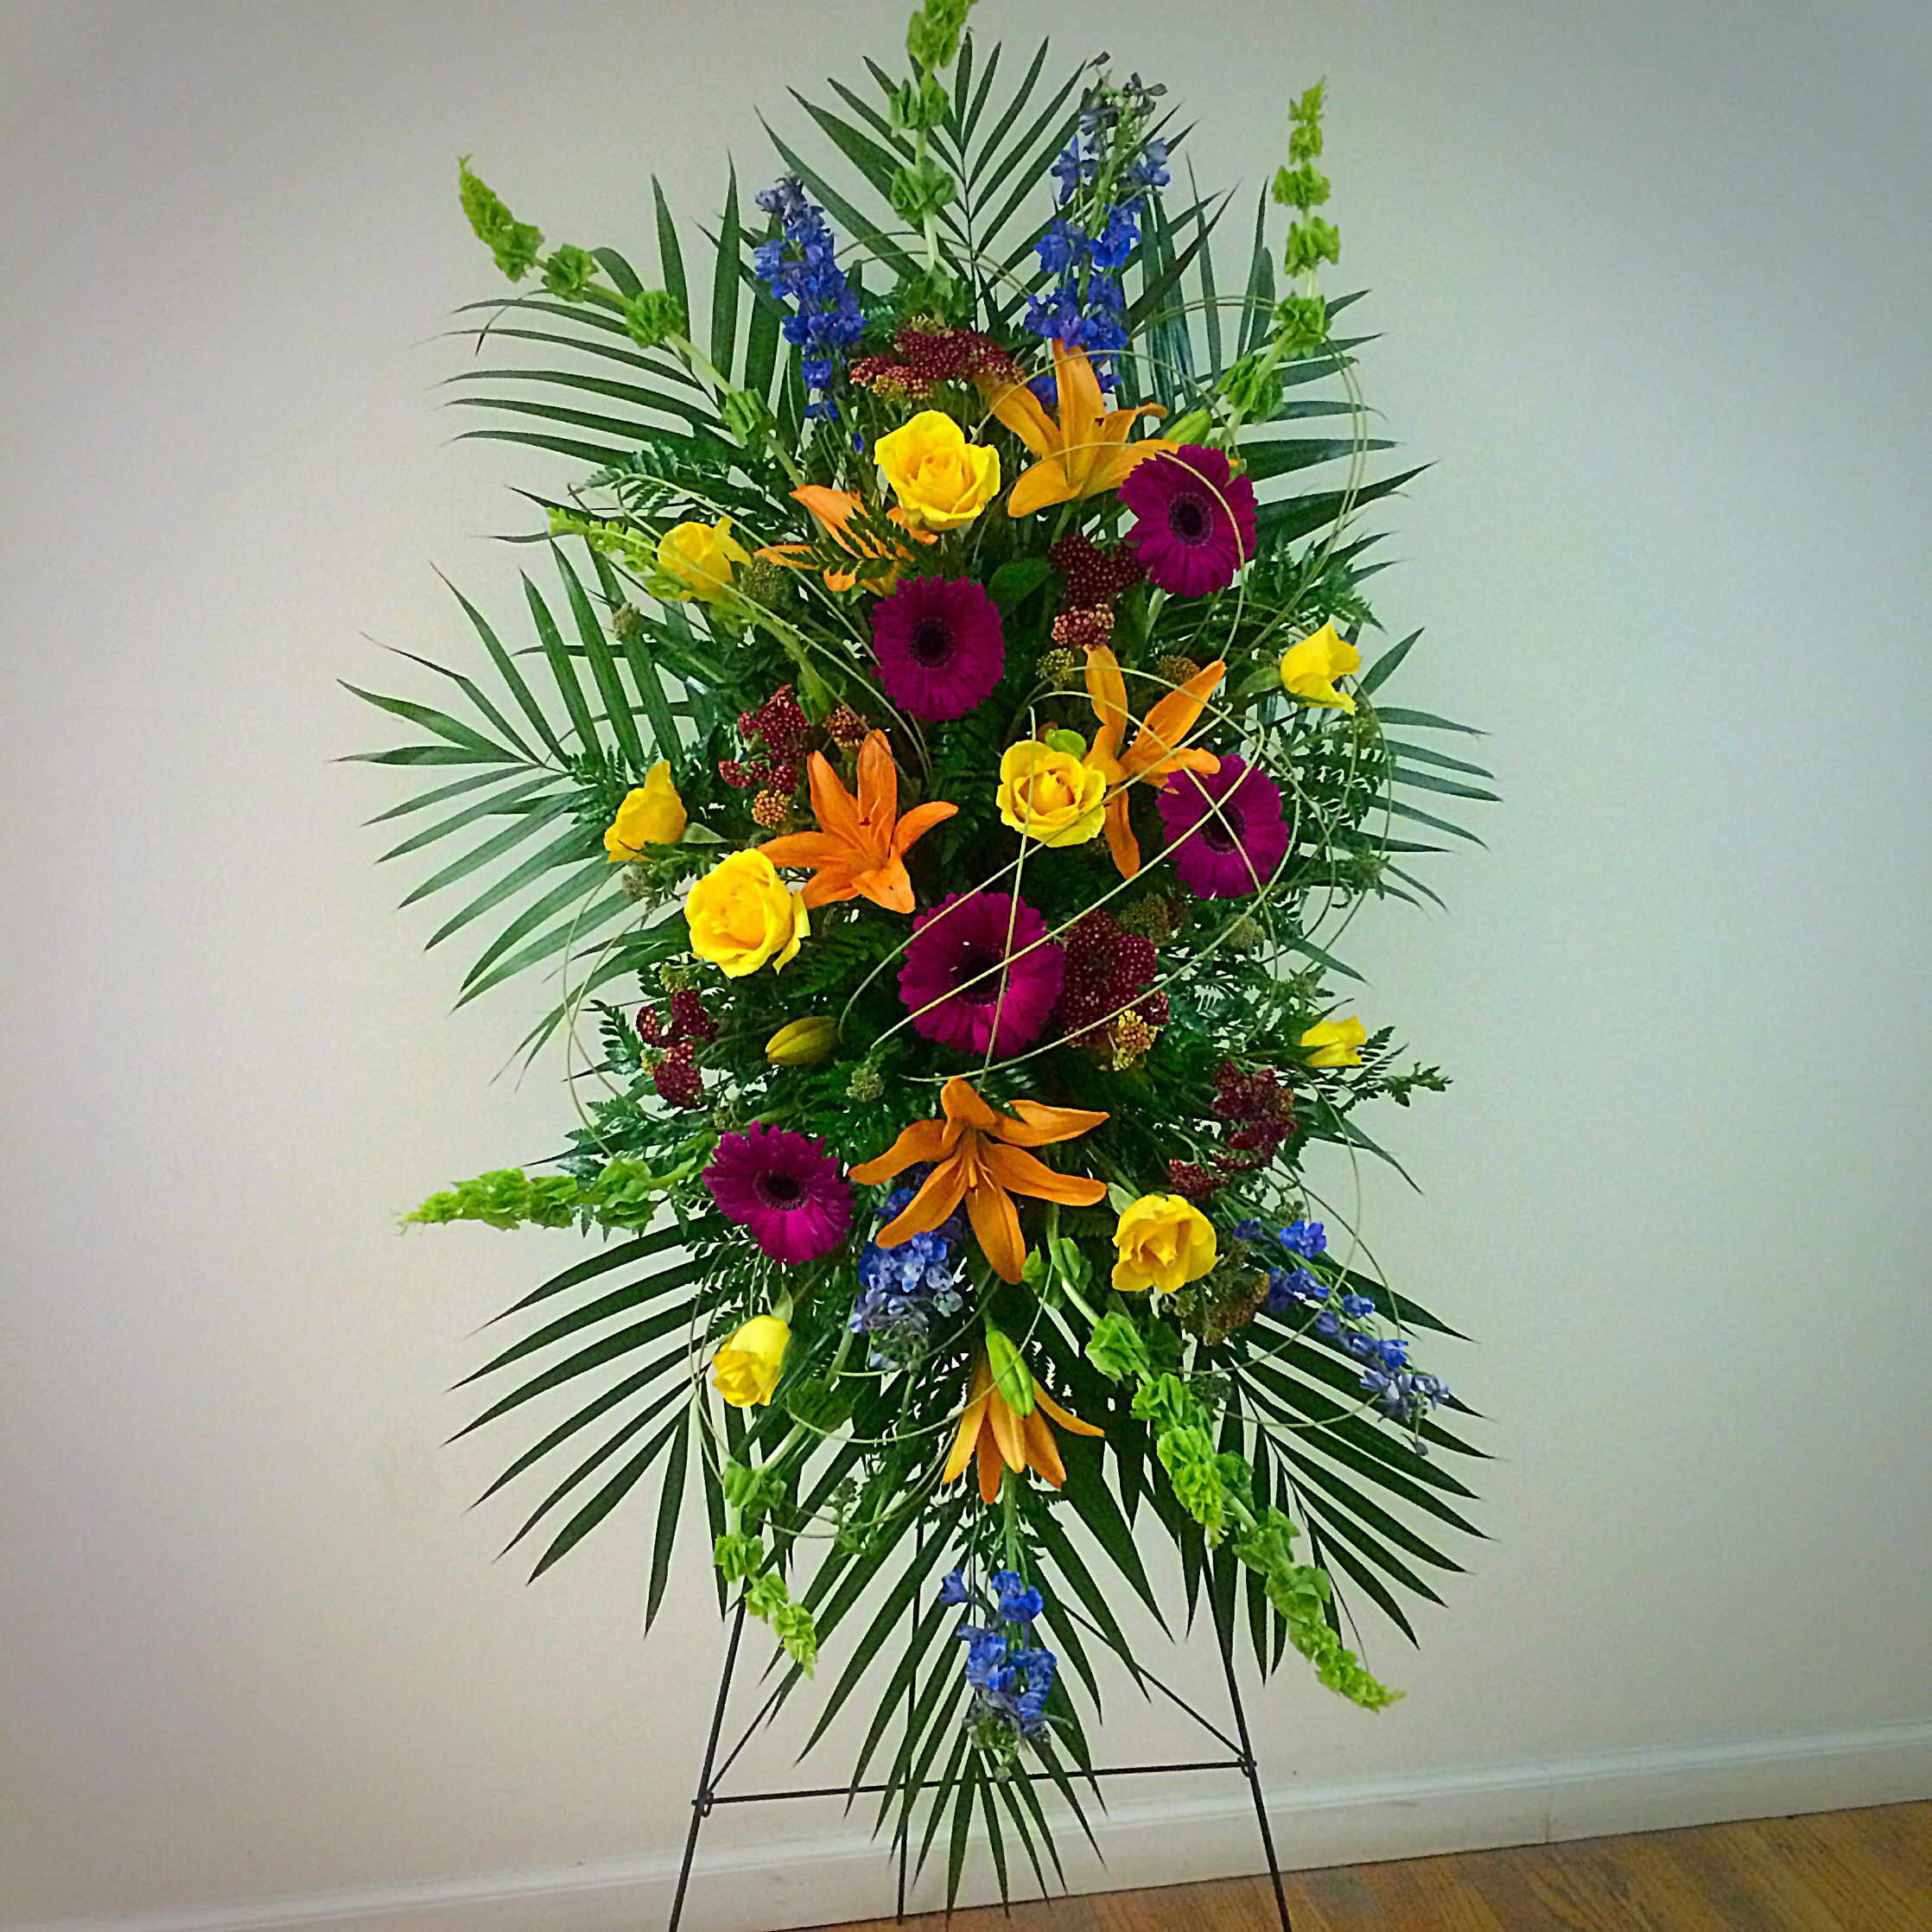 Funeral flower arrangement modern hanging easel terris flower funeral flower arrangement modern hanging easel terris flower shop by samantha dhlflorist Image collections